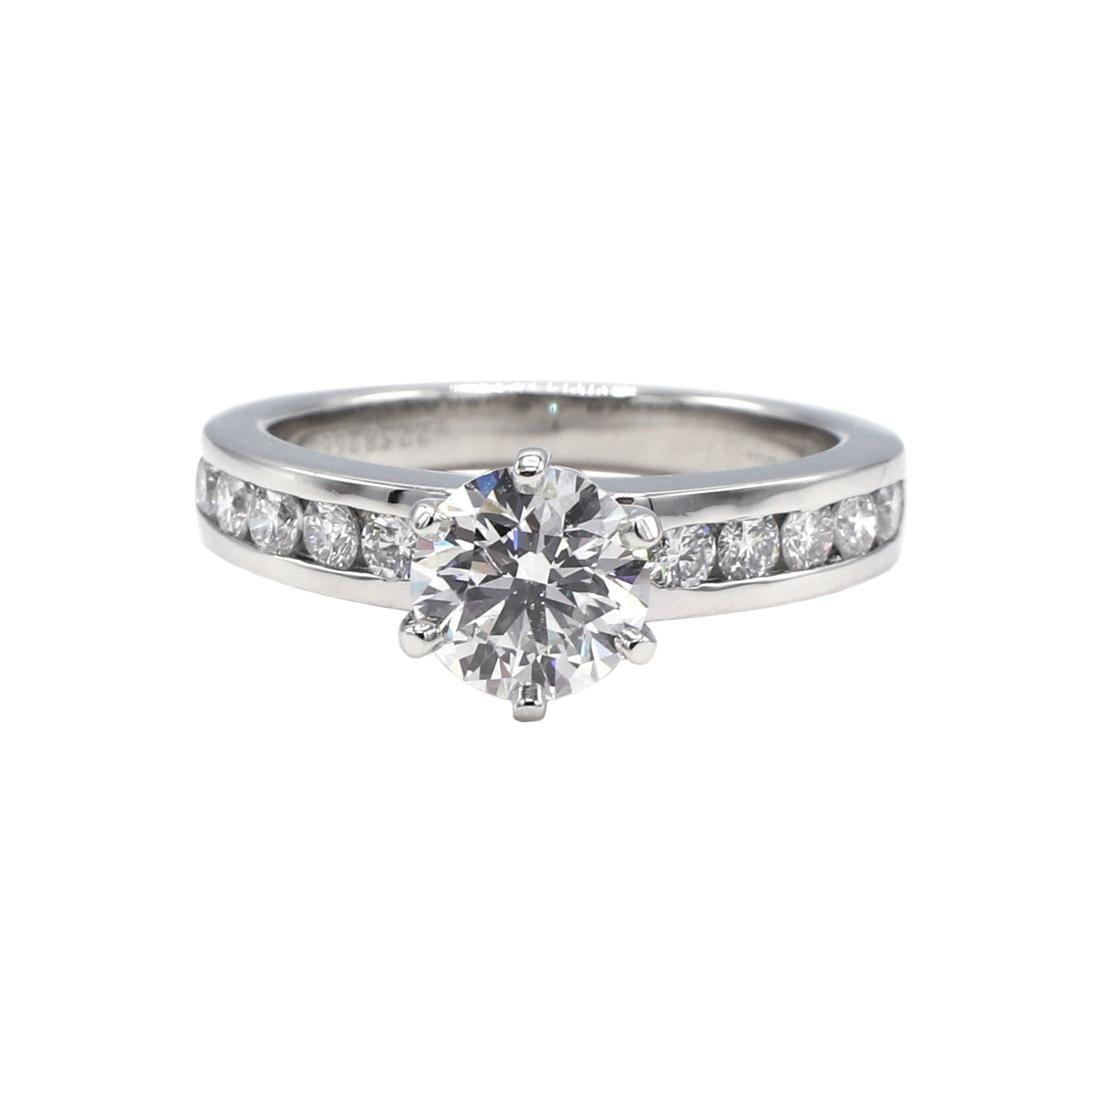 Tiffany & Co. Platinum .91 Carat F VVS1 Round Brilliant Diamond Engagement Ring